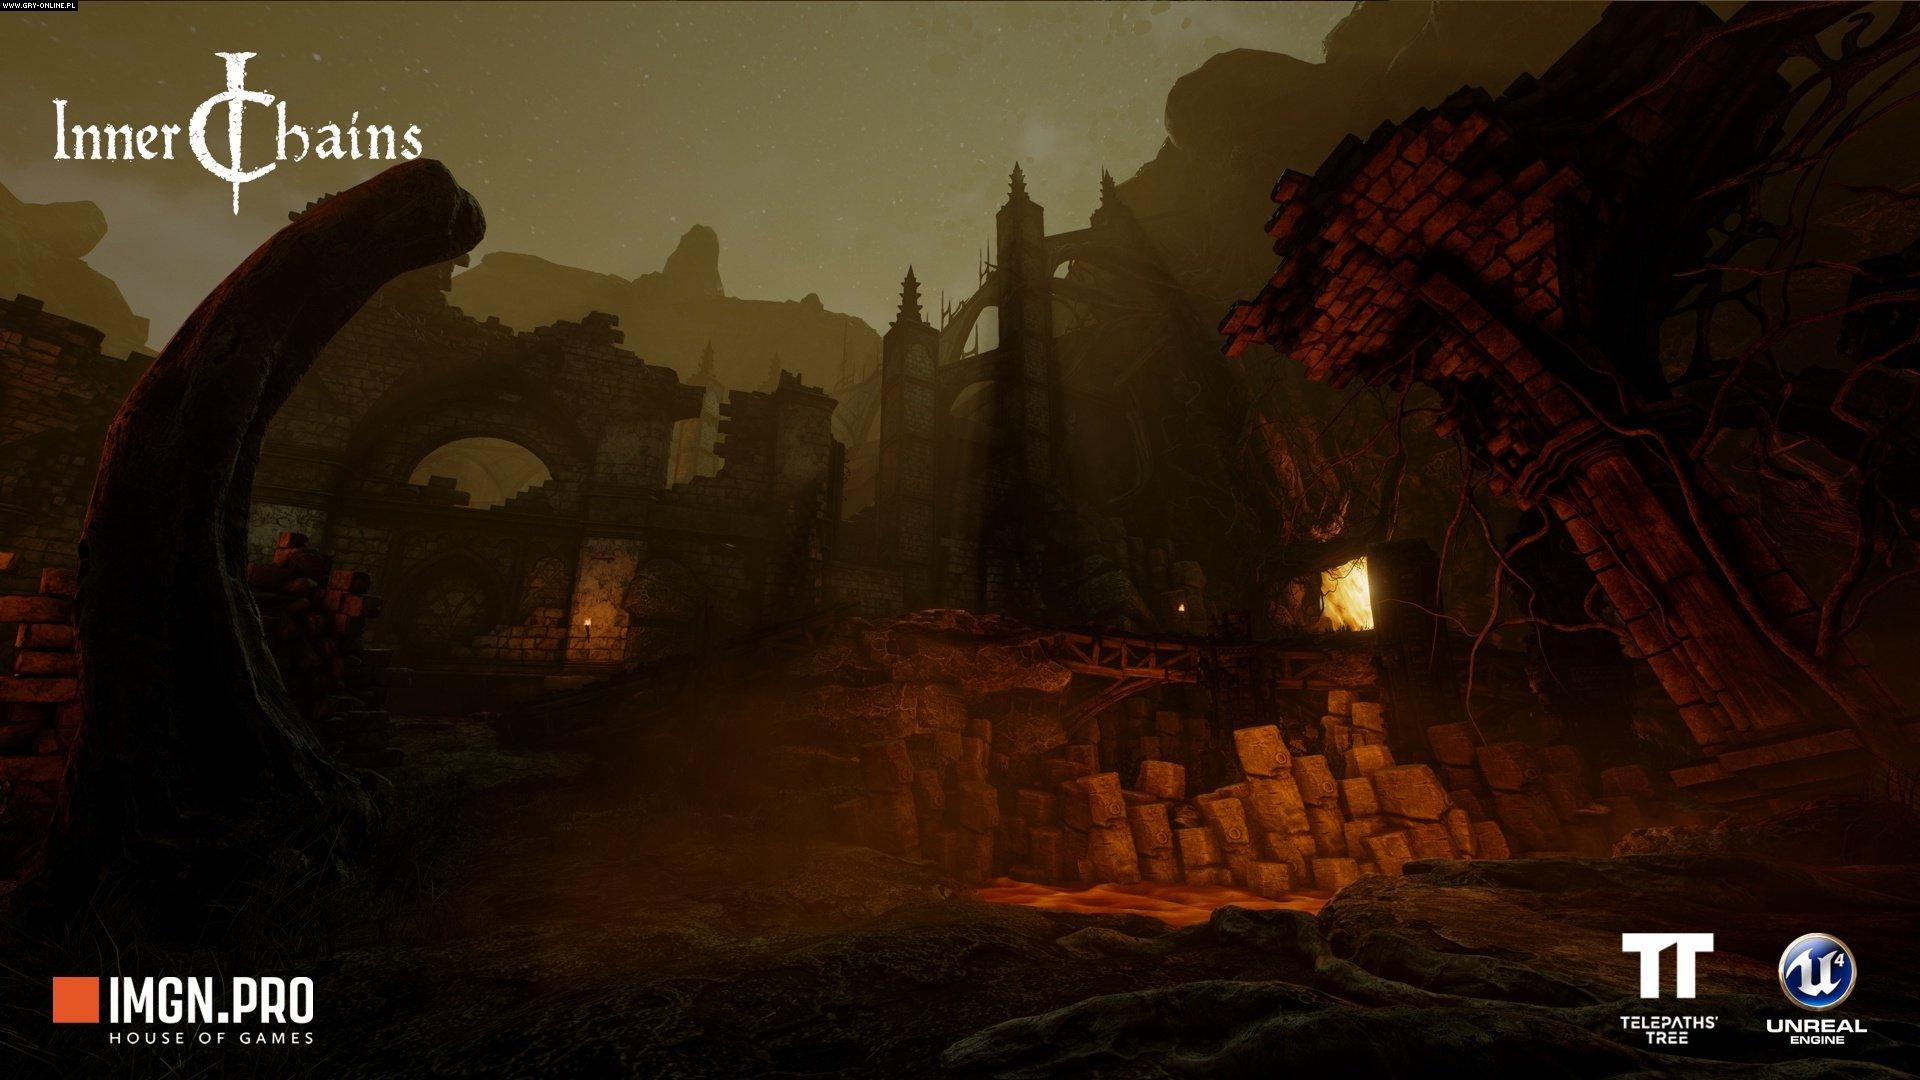 Inner Chains PC, PS4, XONE Games Image 46/86, Telepath's Tree, IMGN.PRO